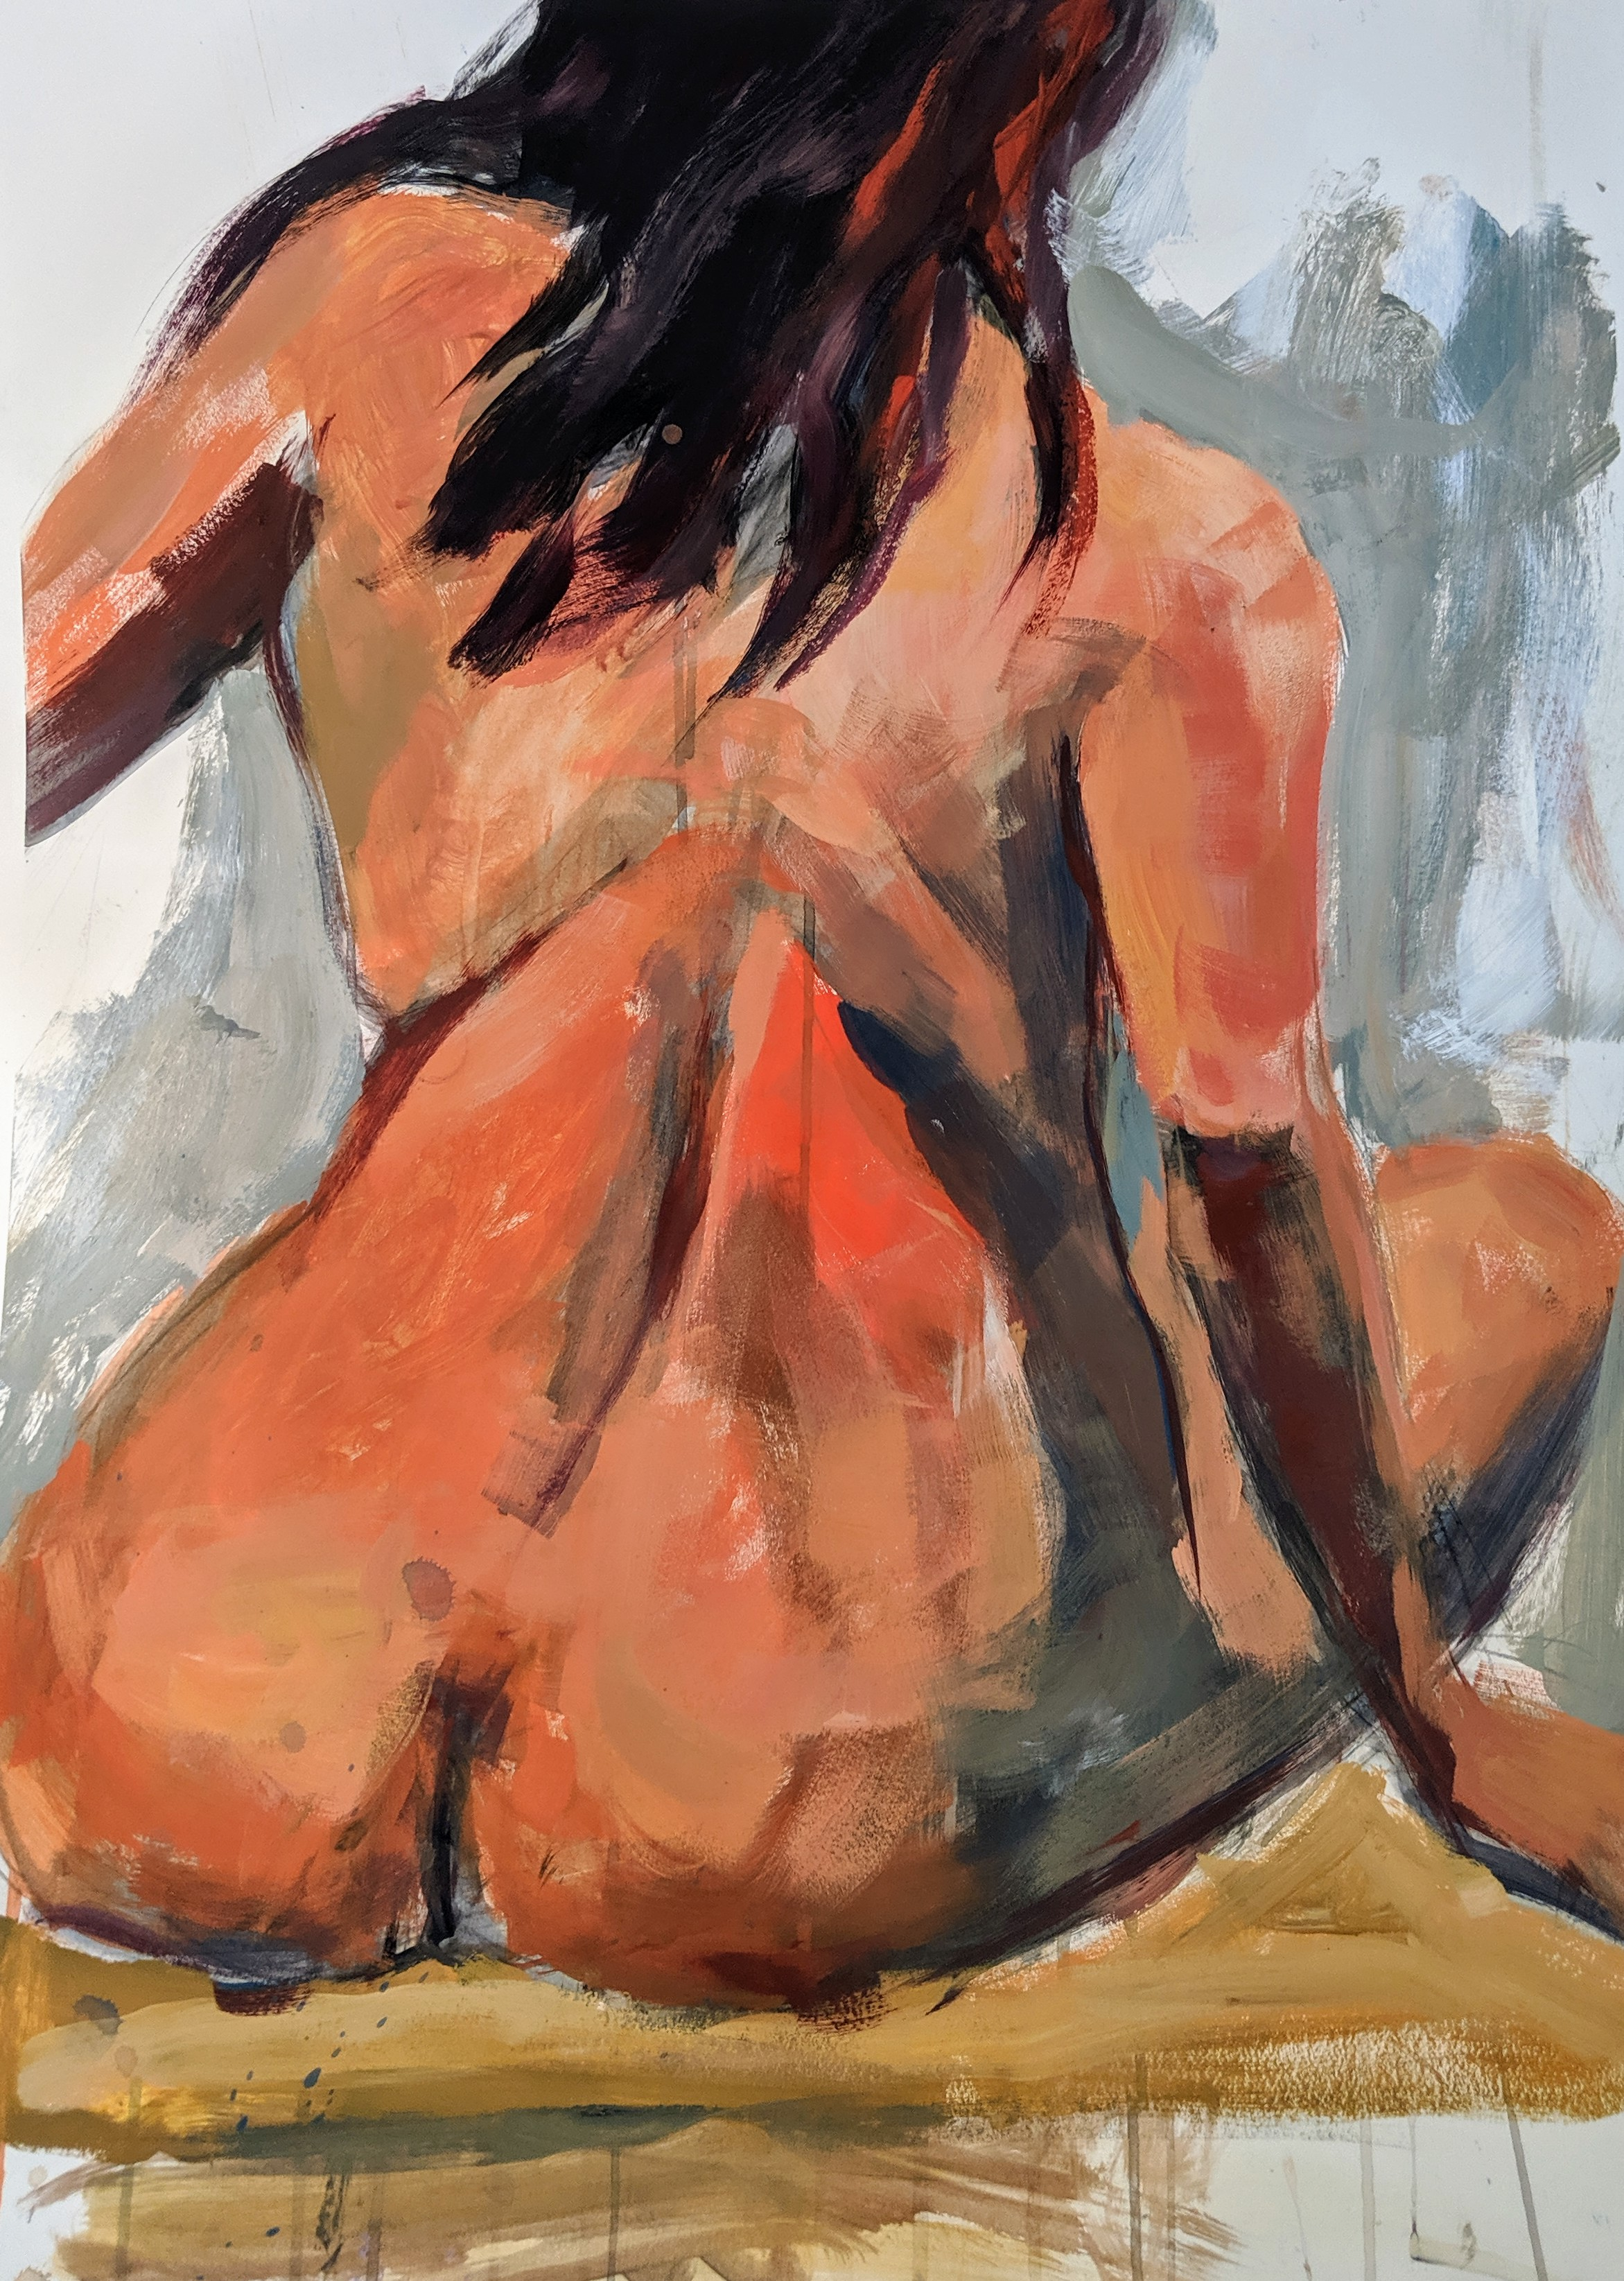 ©2019 Maria Kolligian | Figure Painting & Drawing Workshop, San Luis Obispo County (Arroyo Grande, CA) | David Limrite, Instructor